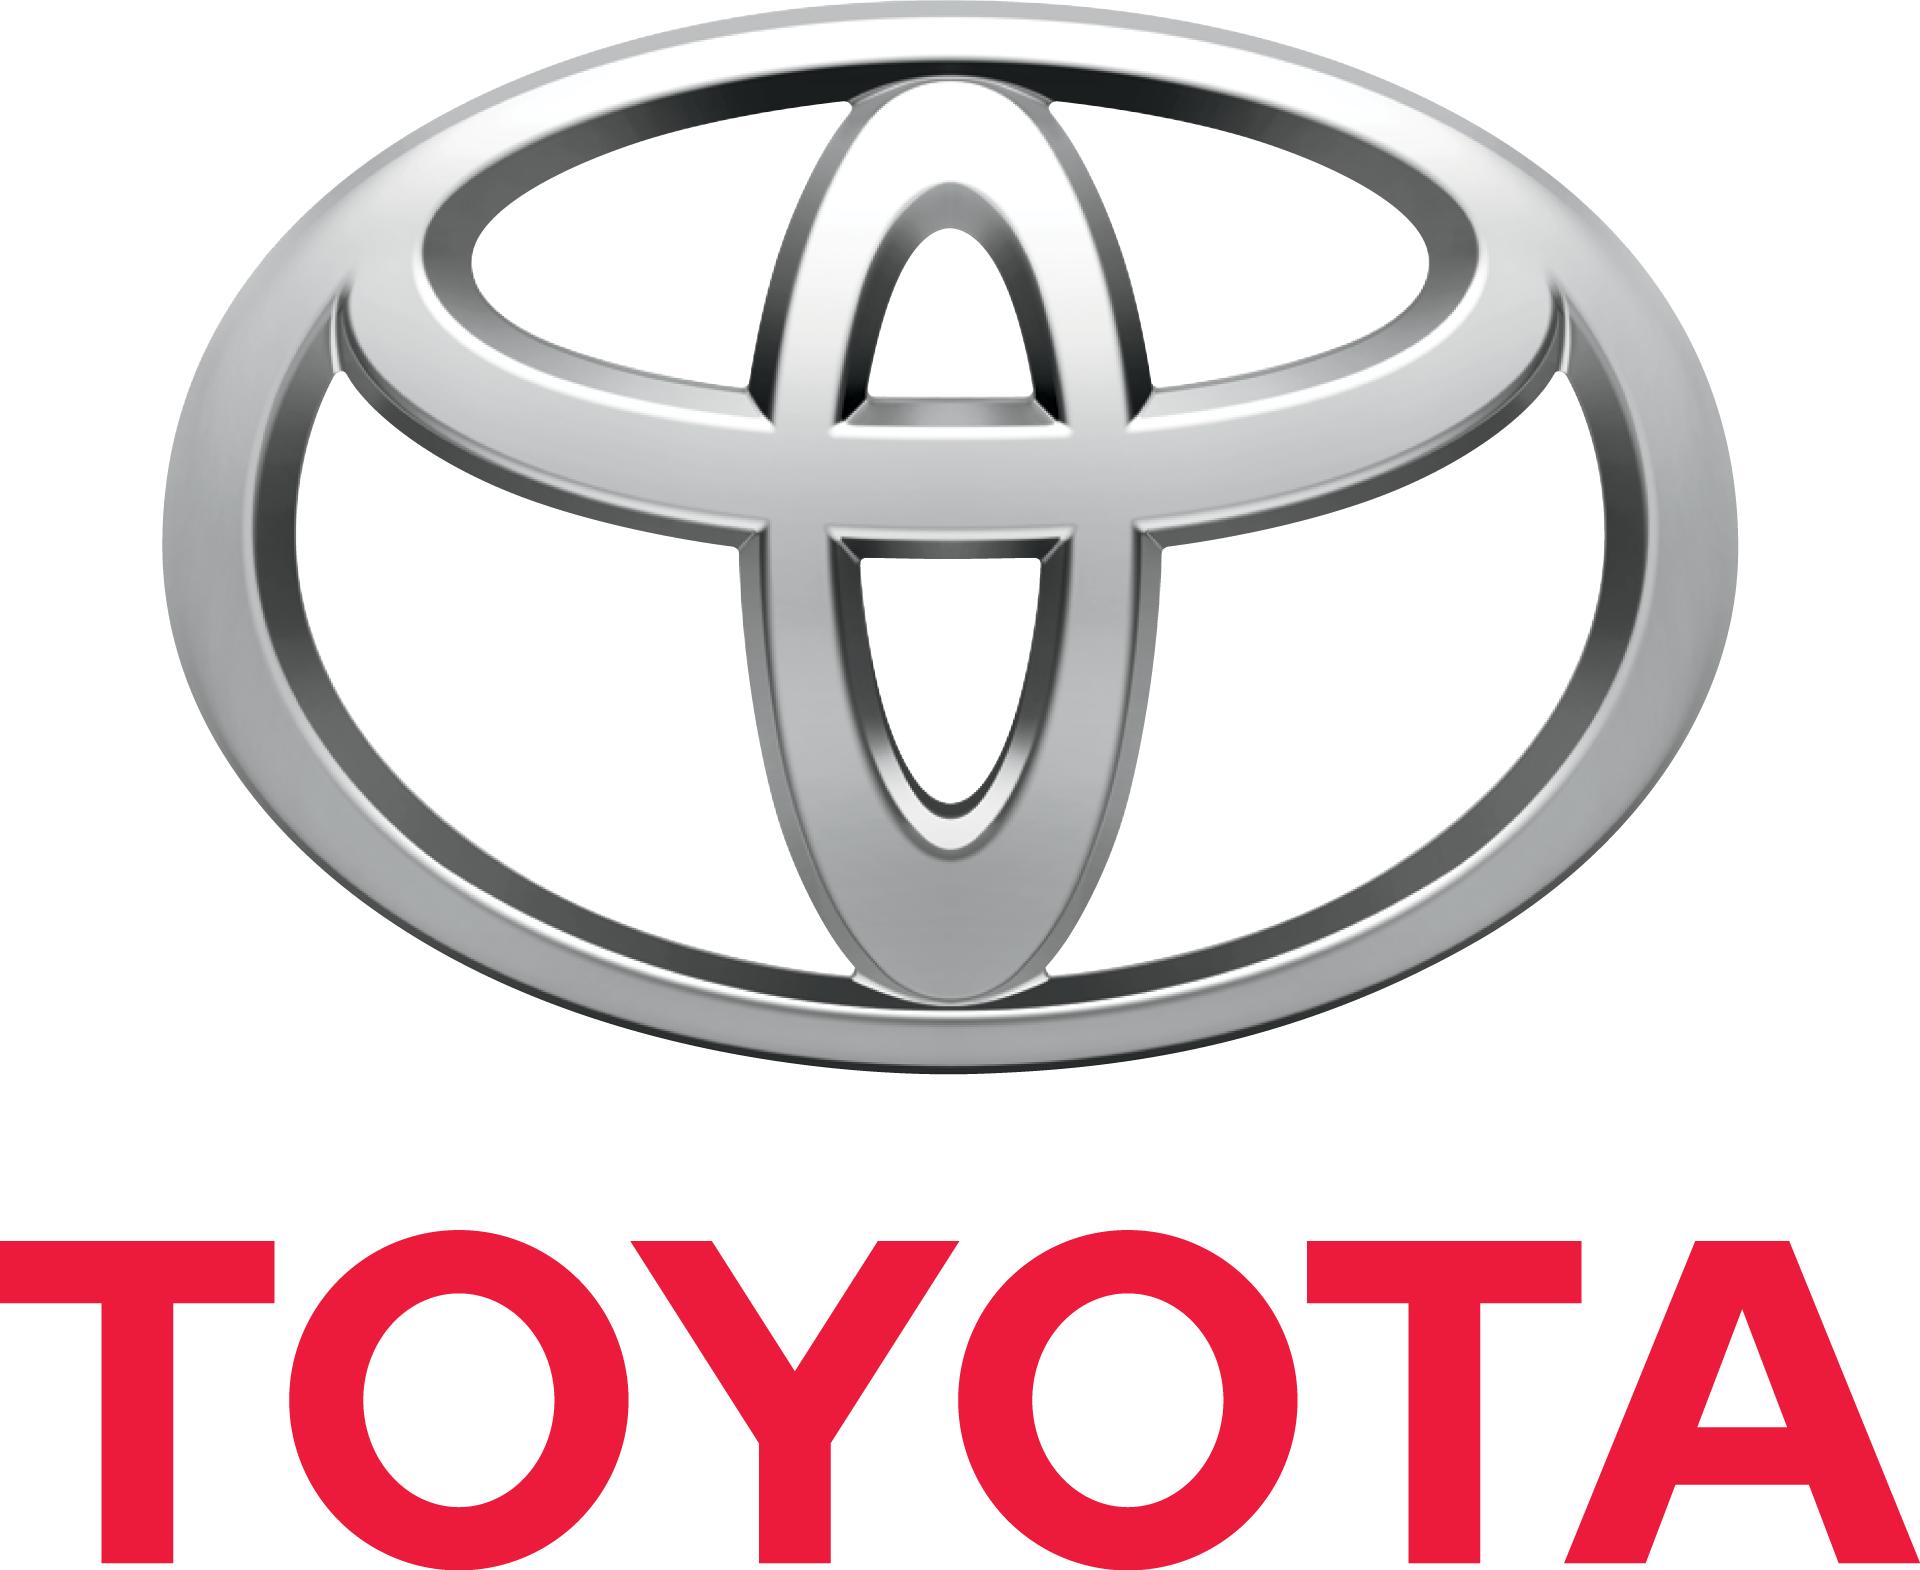 Basi sedile Toyota